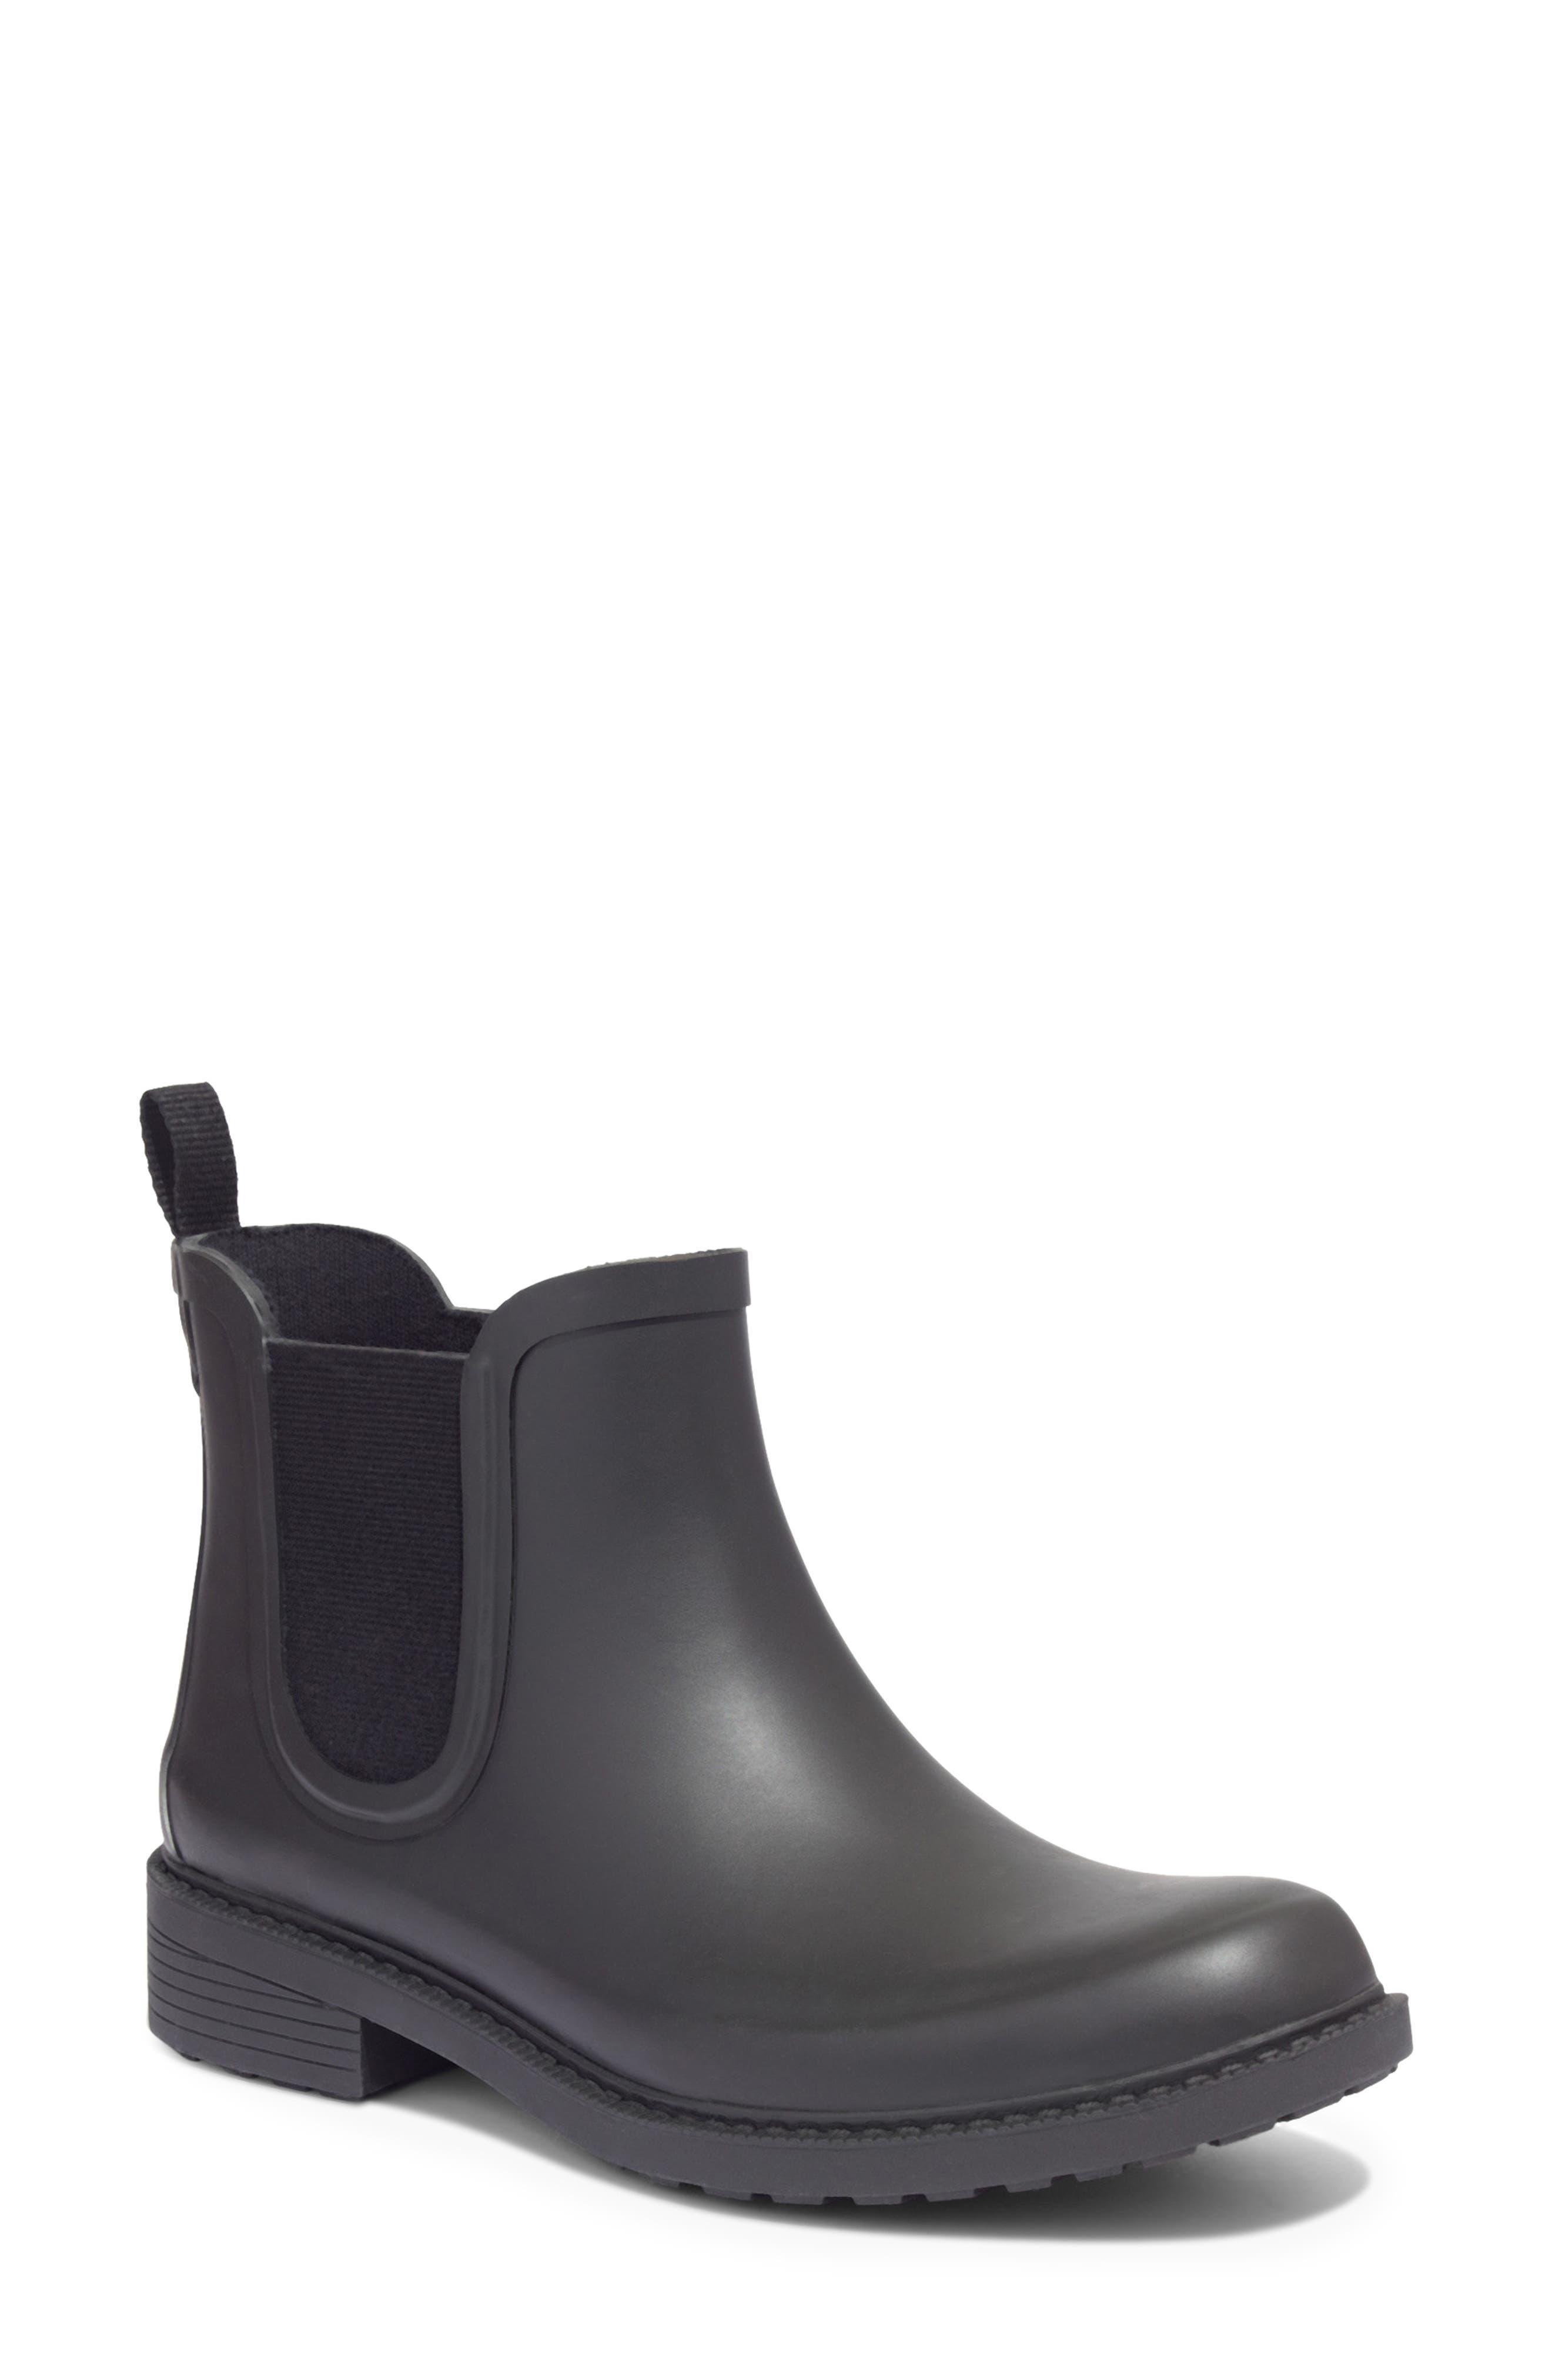 MADEWELL, The Chelsea Rain Boot, Main thumbnail 1, color, TRUE BLACK RUBBER